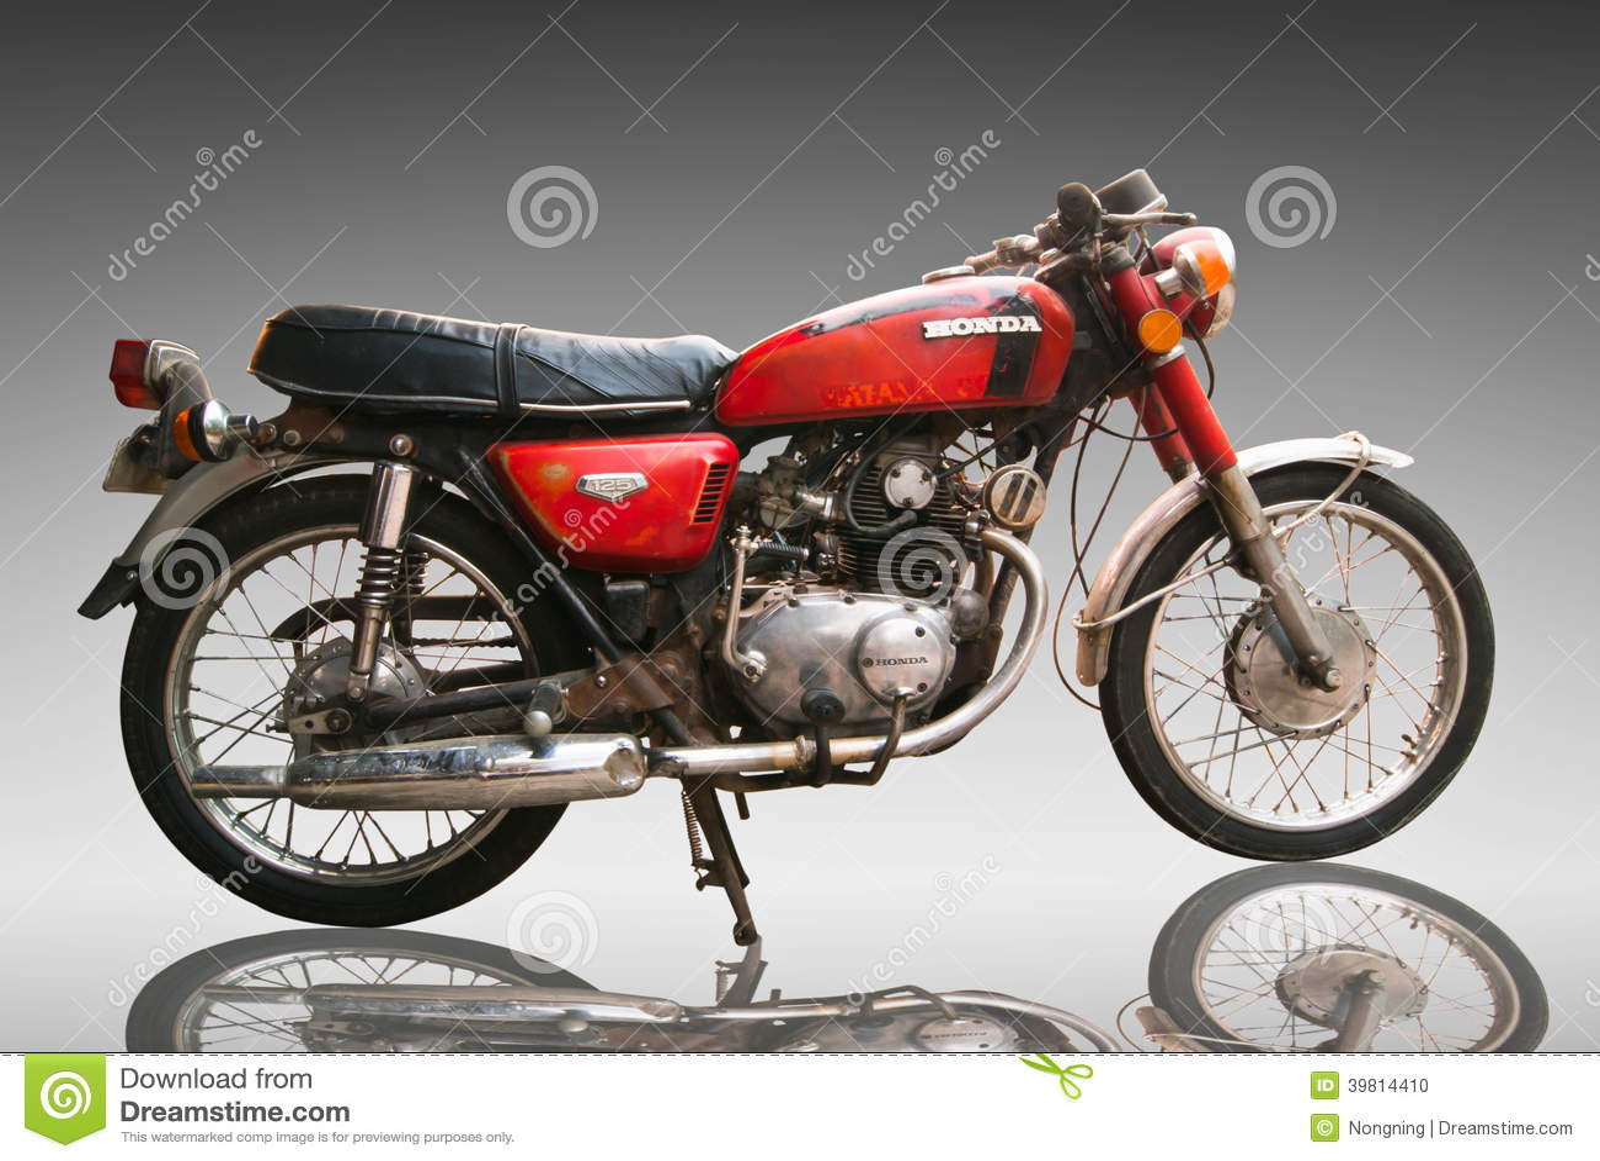 Moto Honda 125 Xl Ide Dimage De 1970 125cc Motorcycle Motocykle